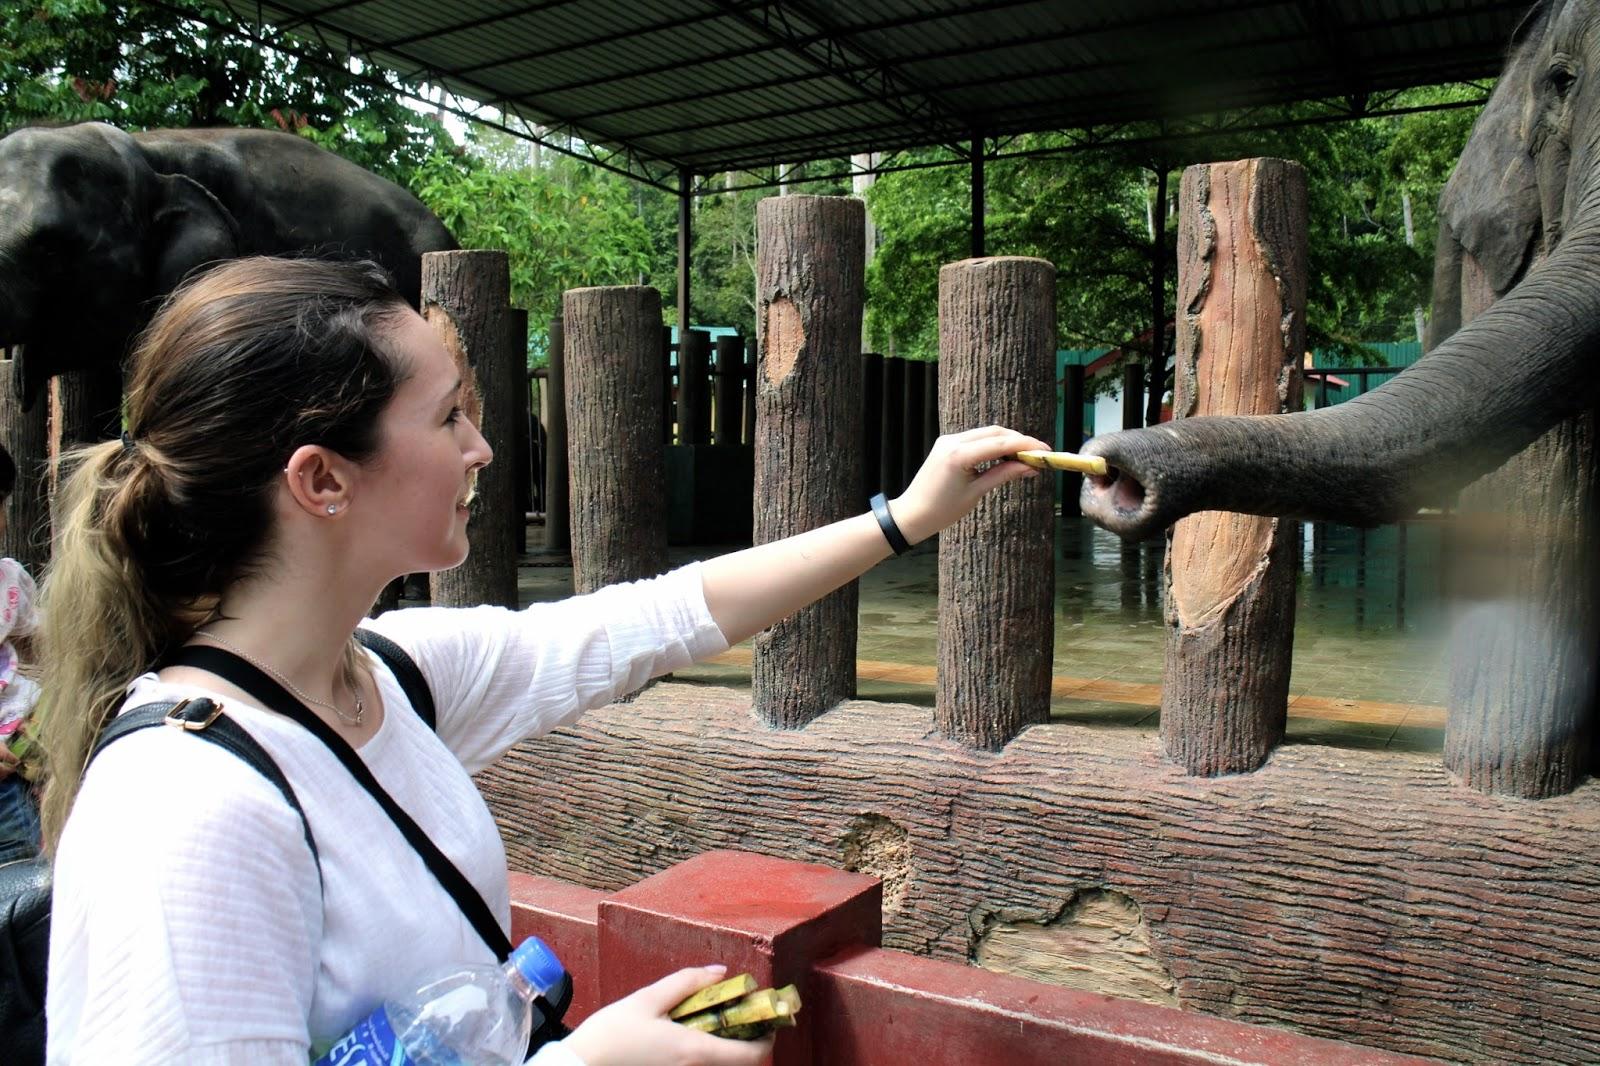 Feeding an elephant in Malaysia | The Dress Diaries